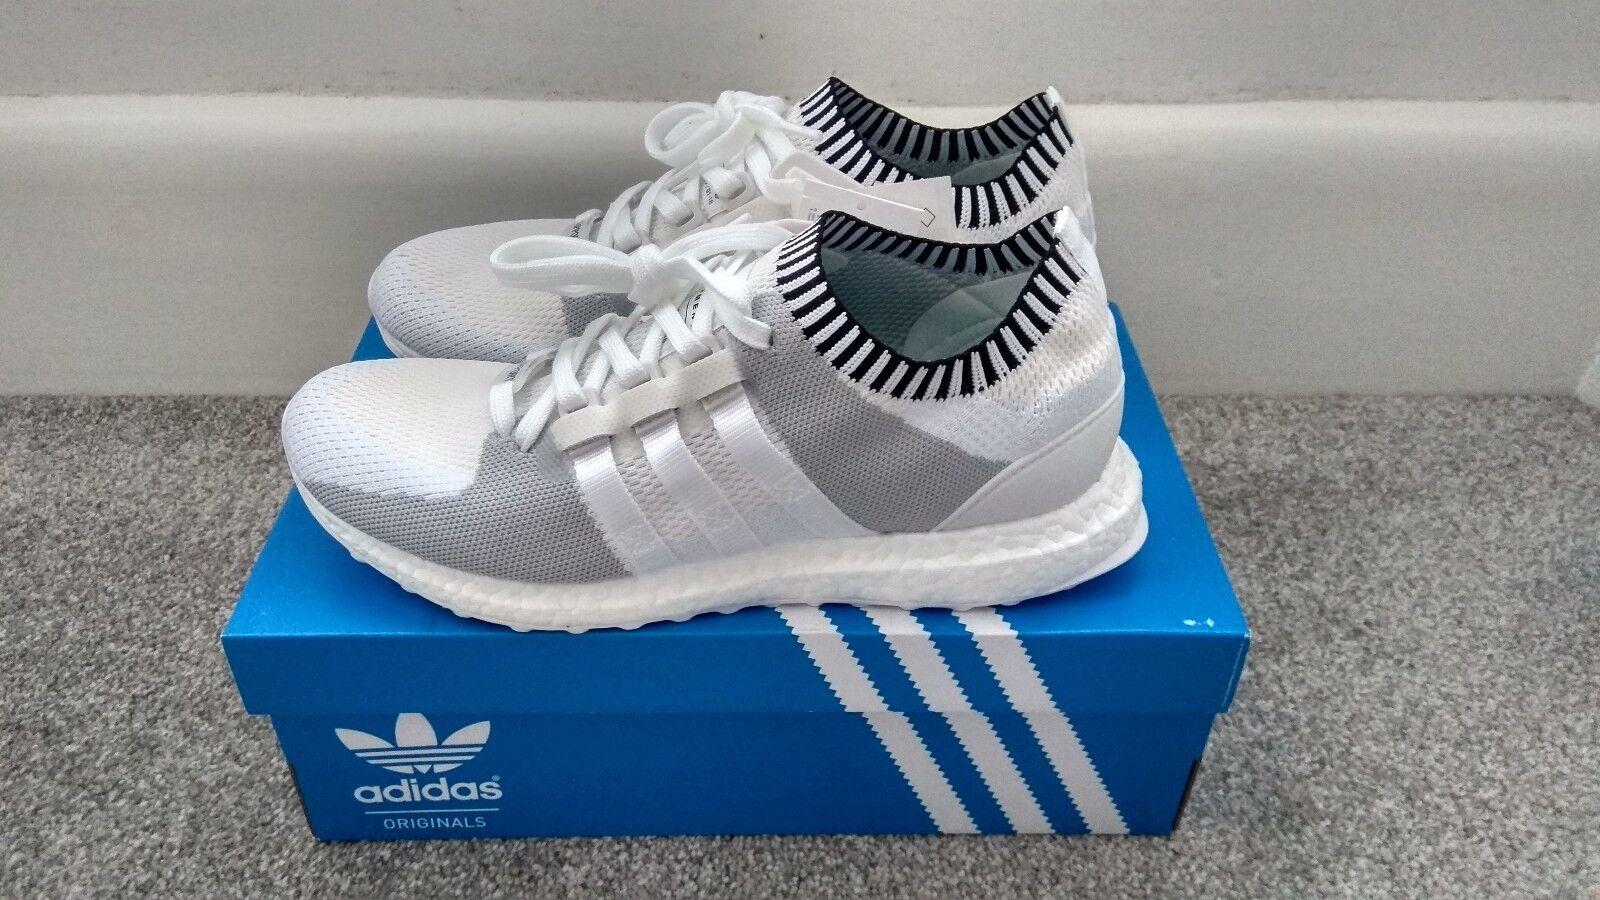 Adidas EQT Support Ultra Primeknit Vintage Bianco, doppia Scatola